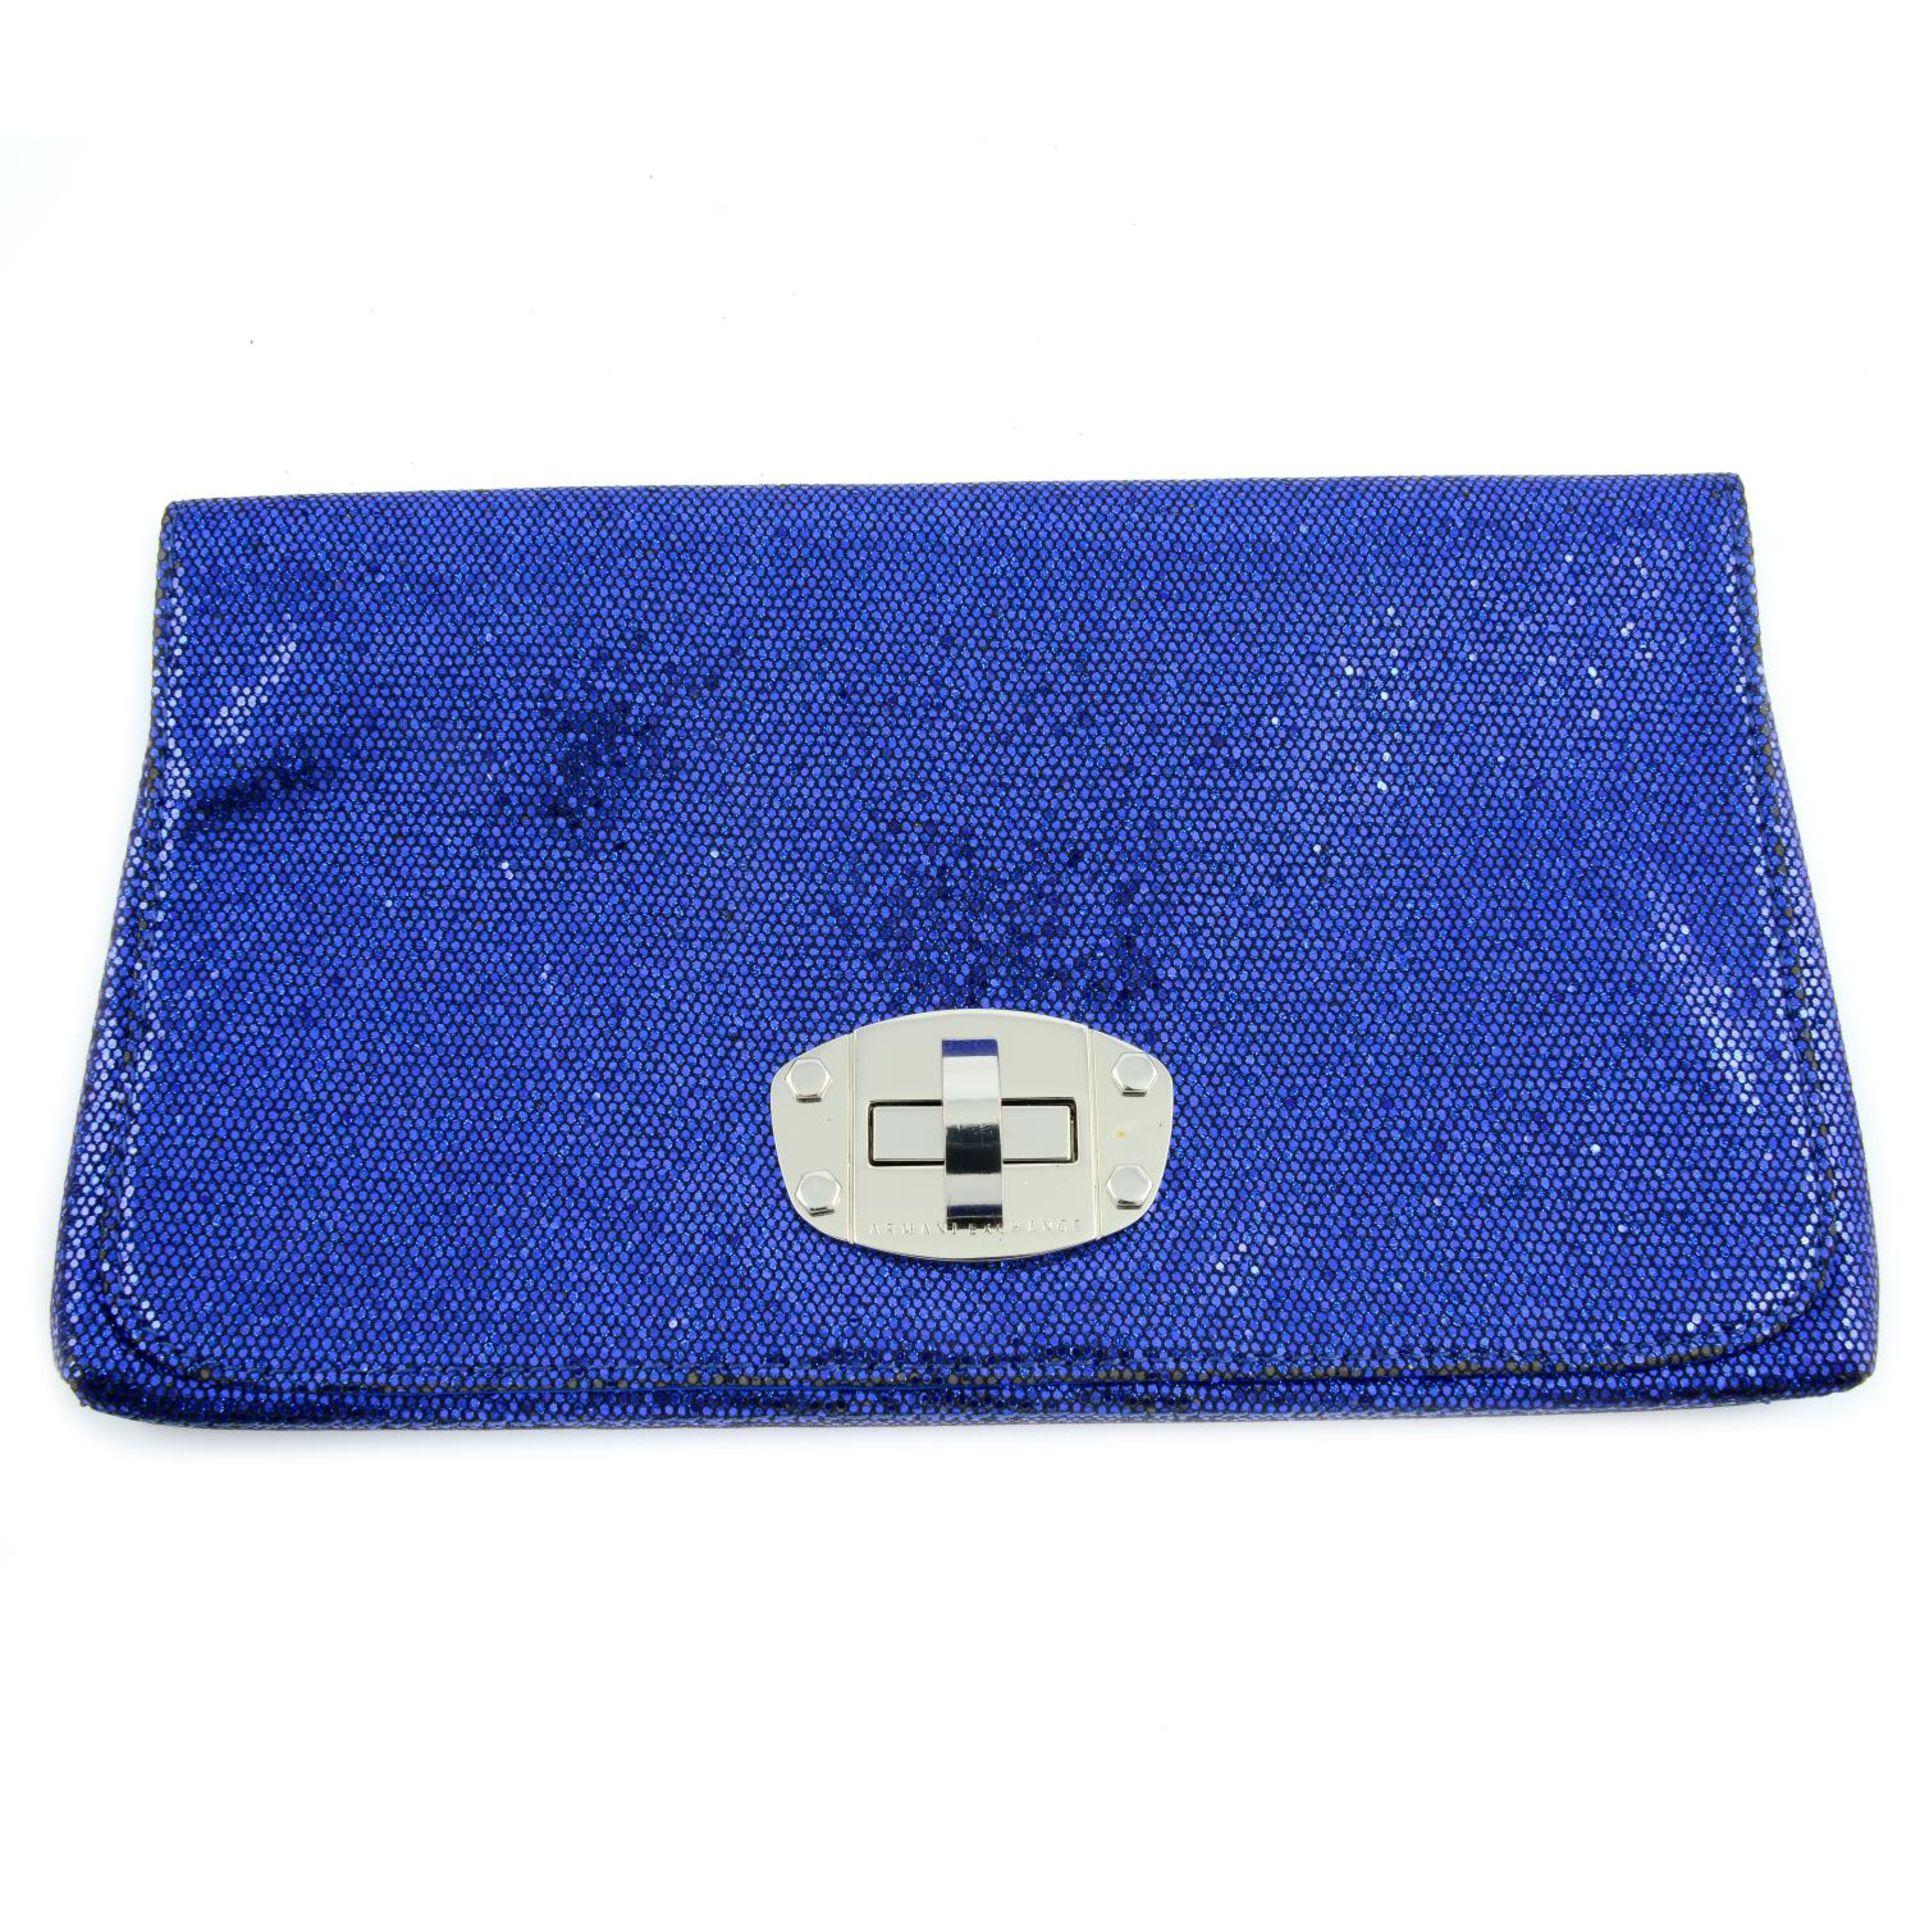 ARMANI EXCHANGE - a blue glitter clutch.